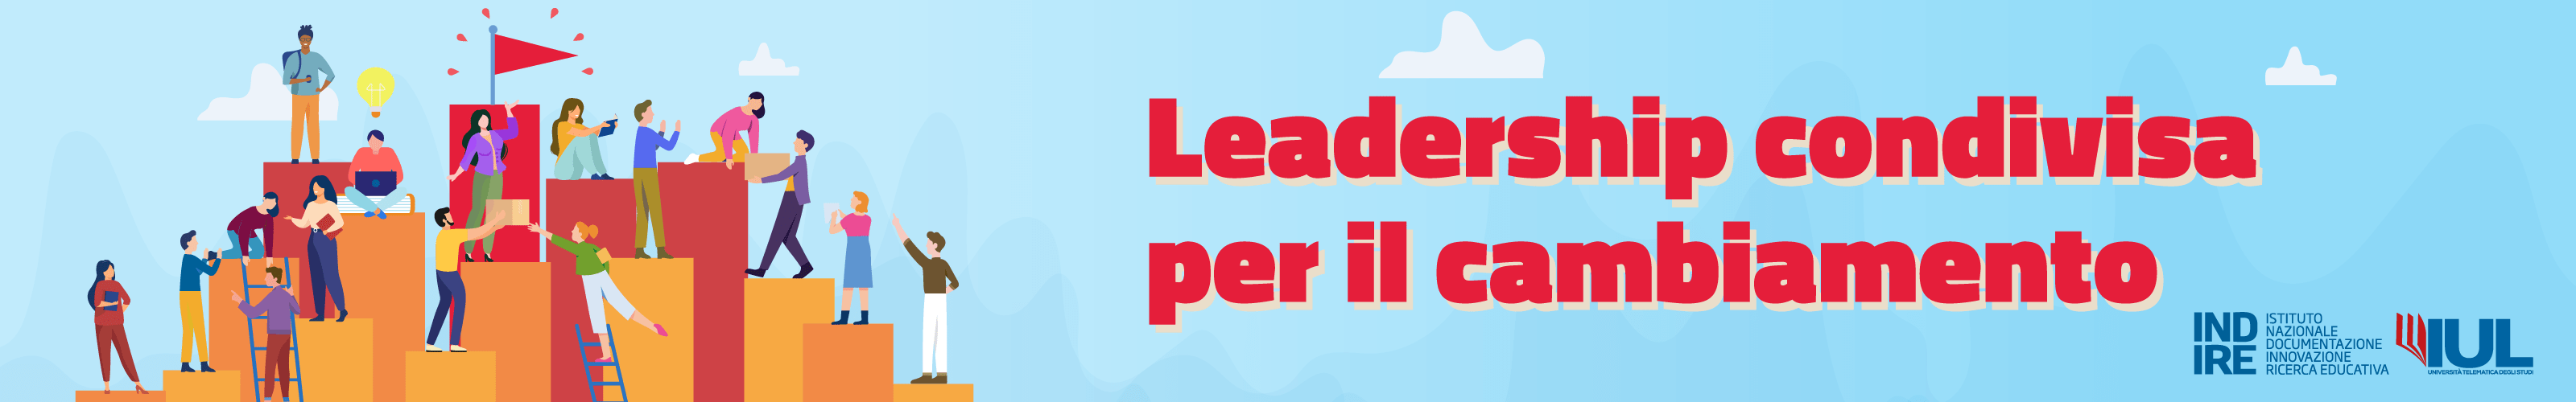 leadership condivisa